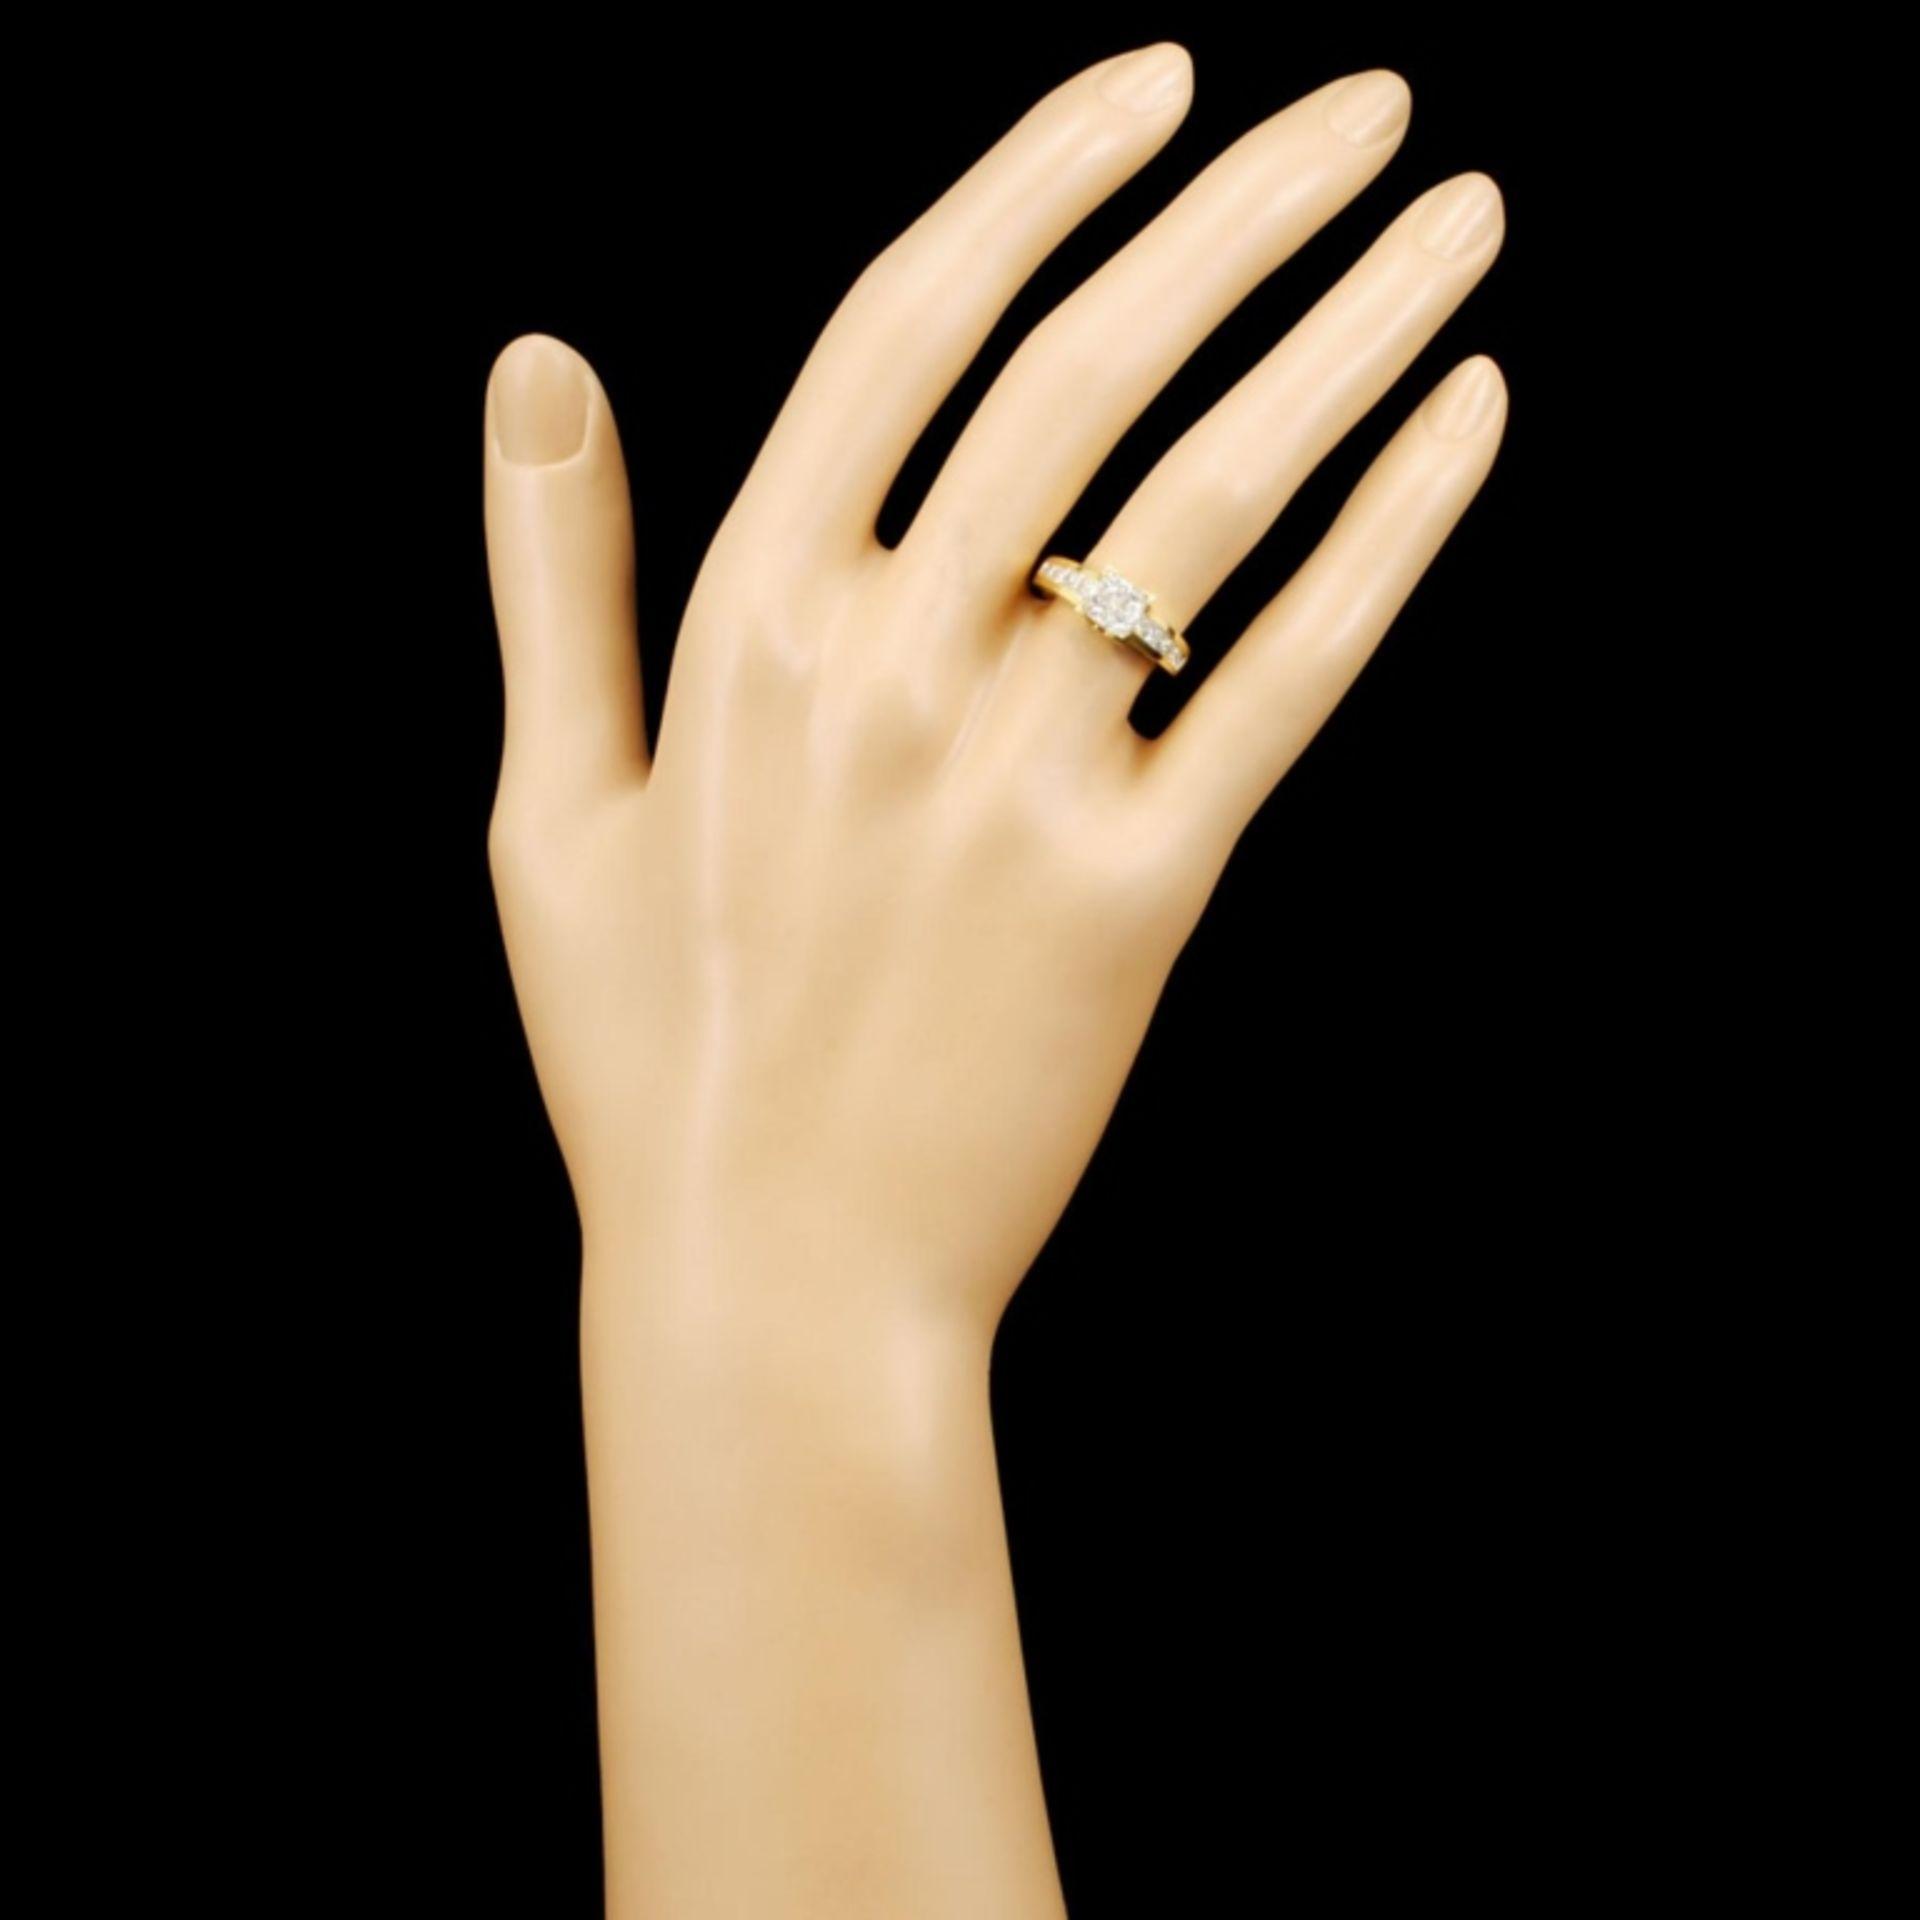 18K Gold 1.50ctw Diamond Ring - Image 4 of 5